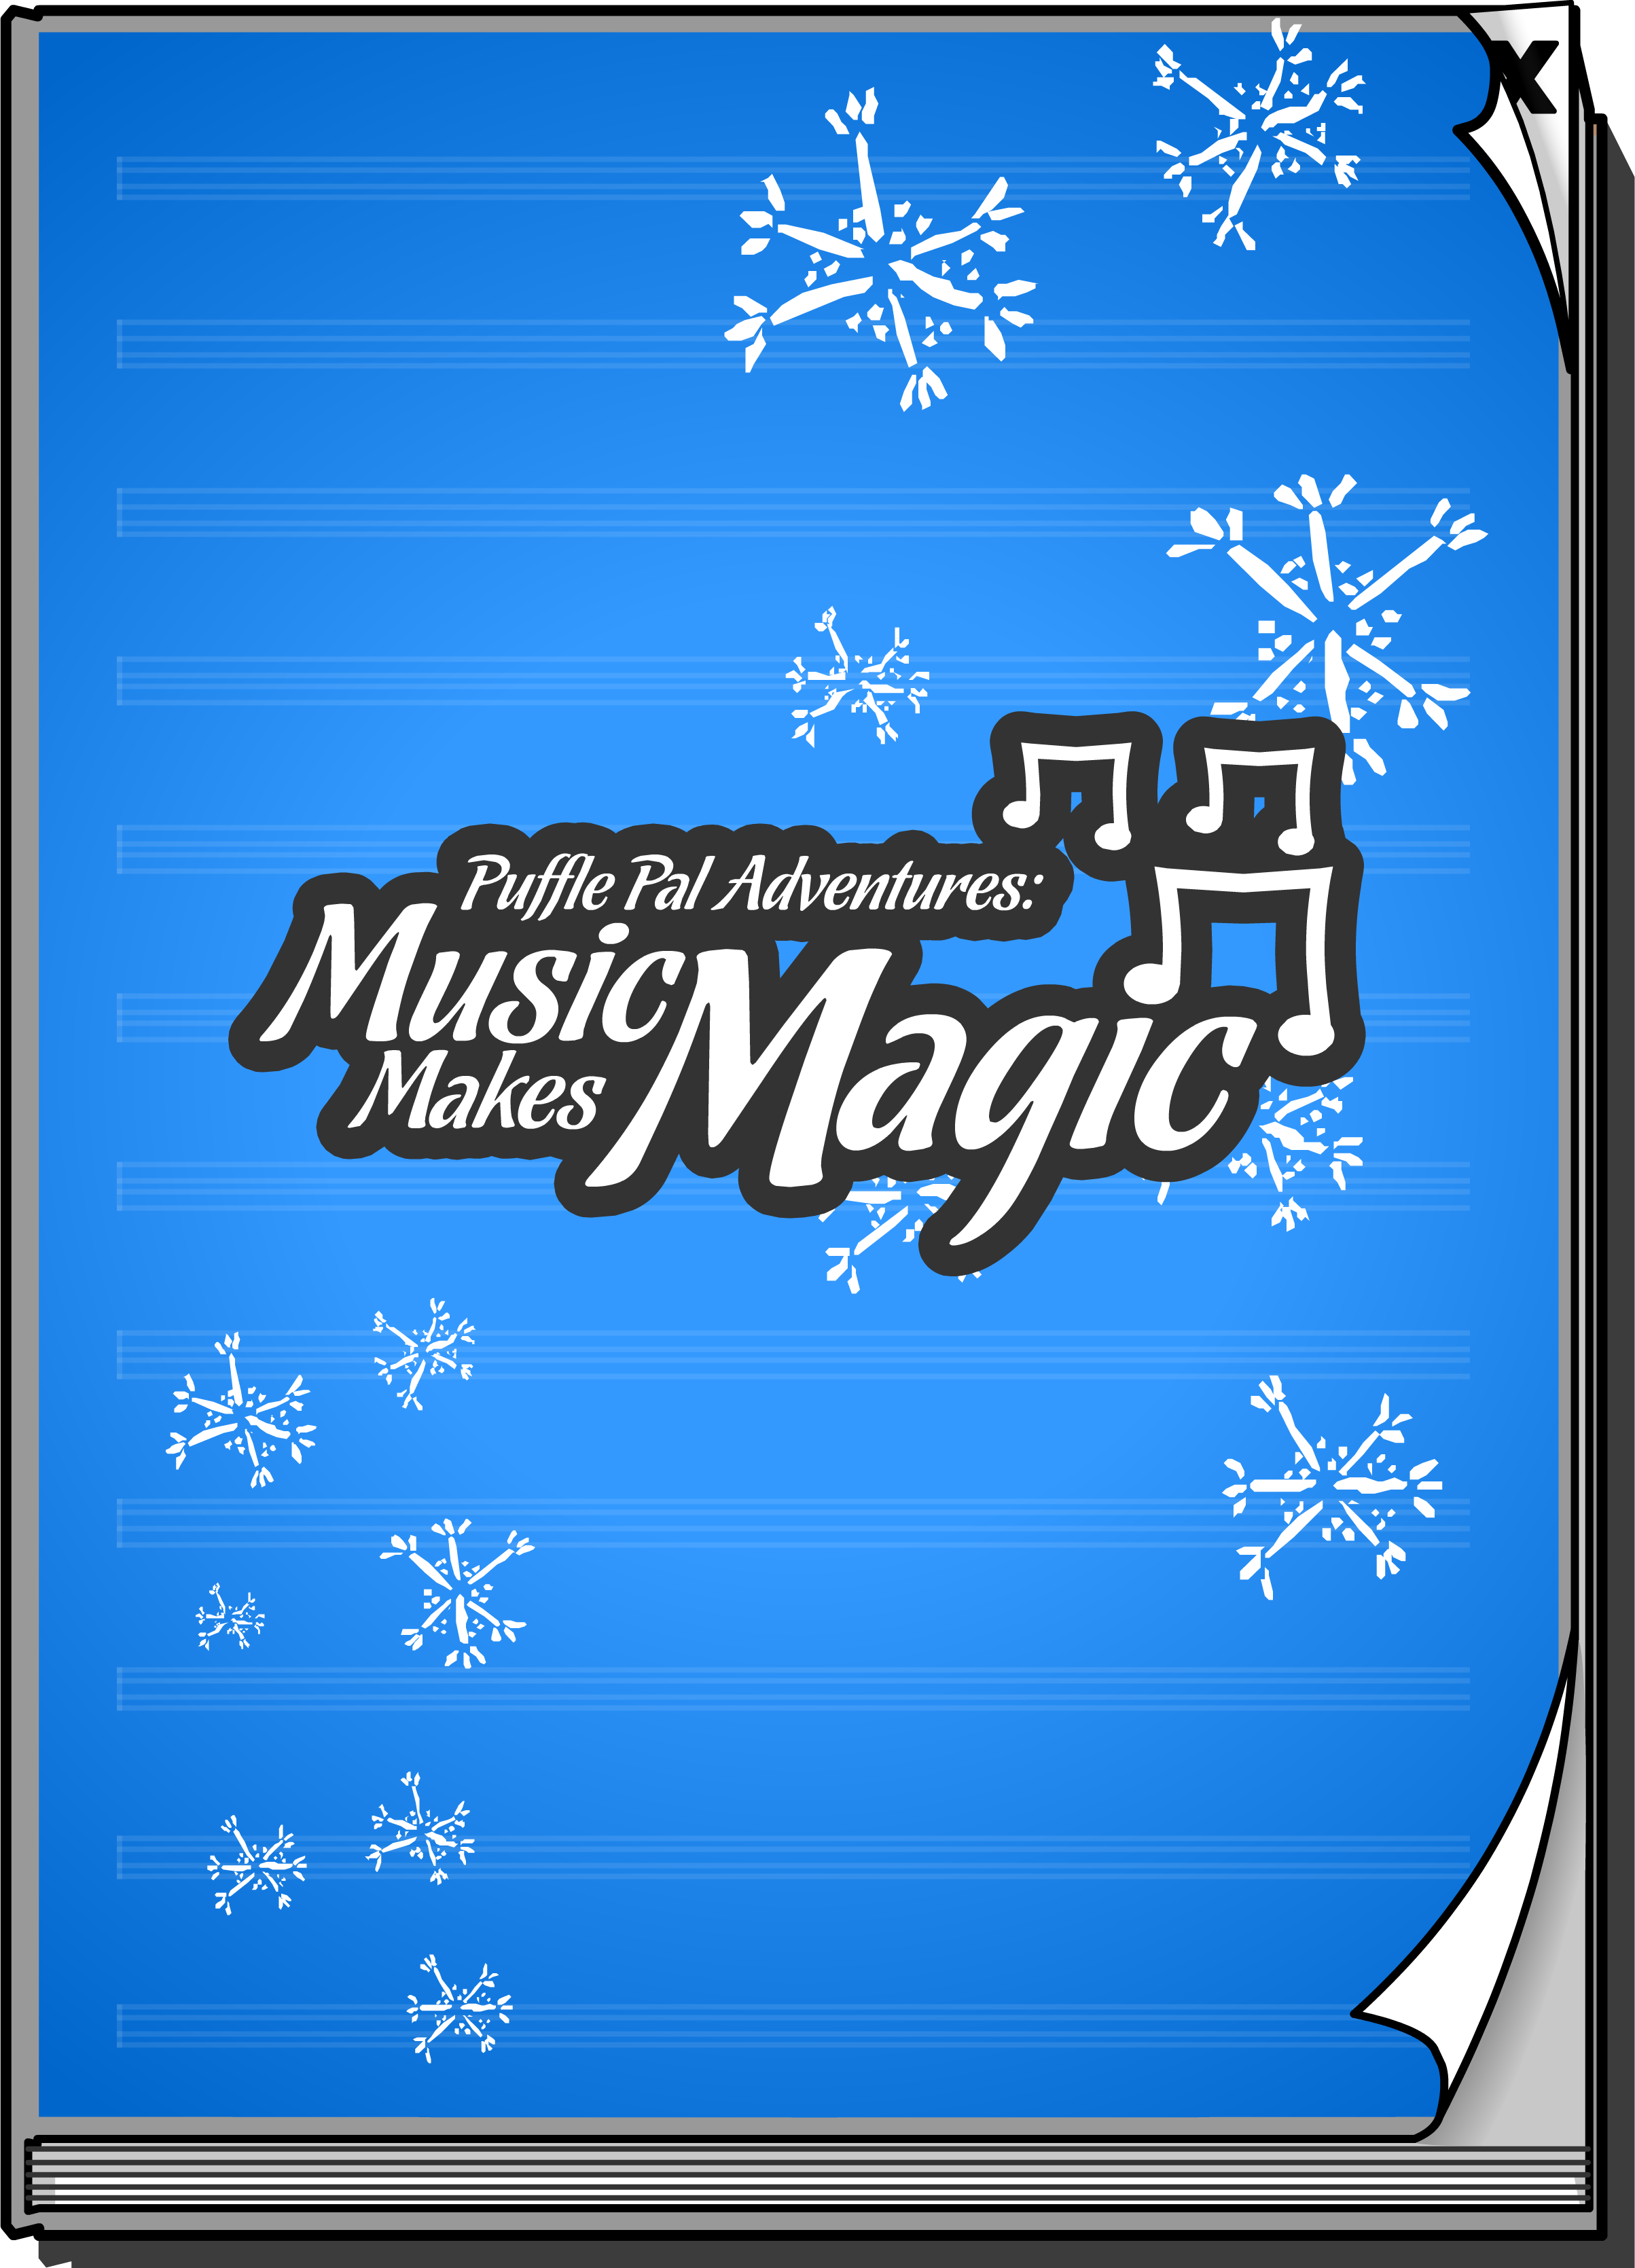 Puffle Pal Adventures: Music Makes Magic